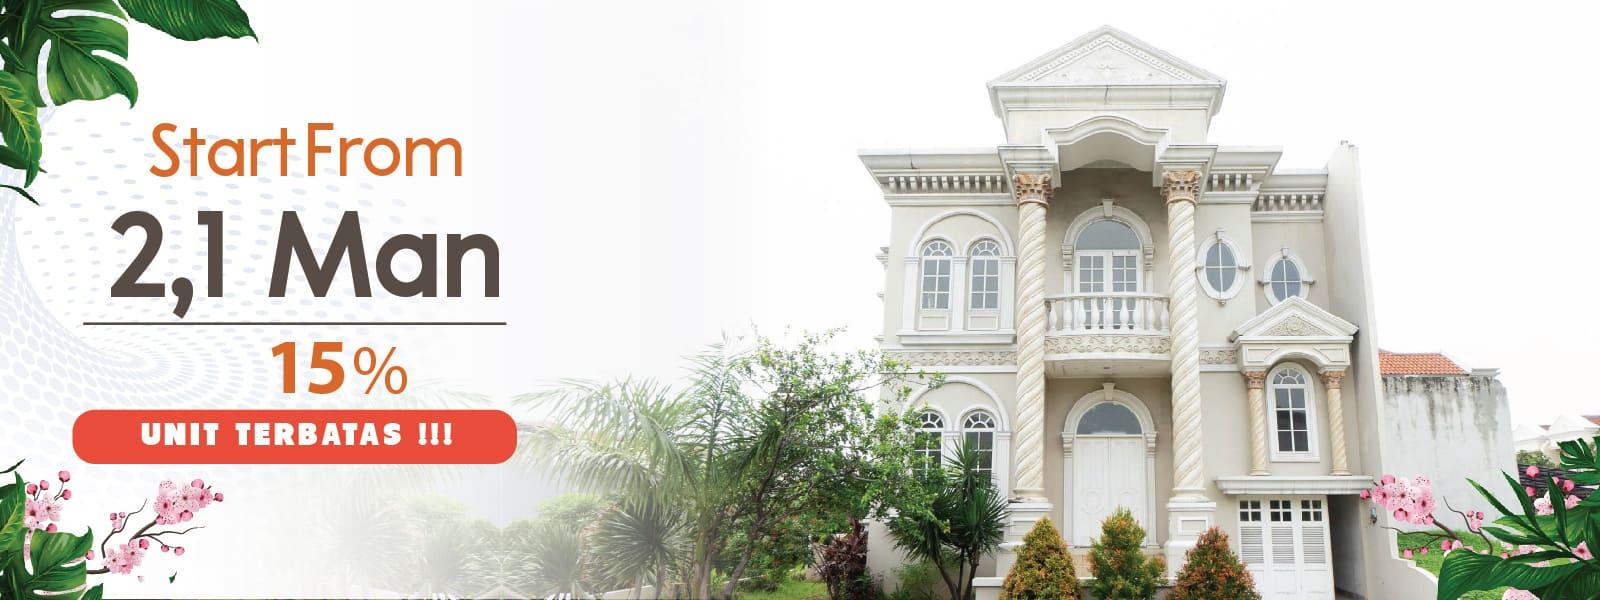 angel-residence-banner-web-update